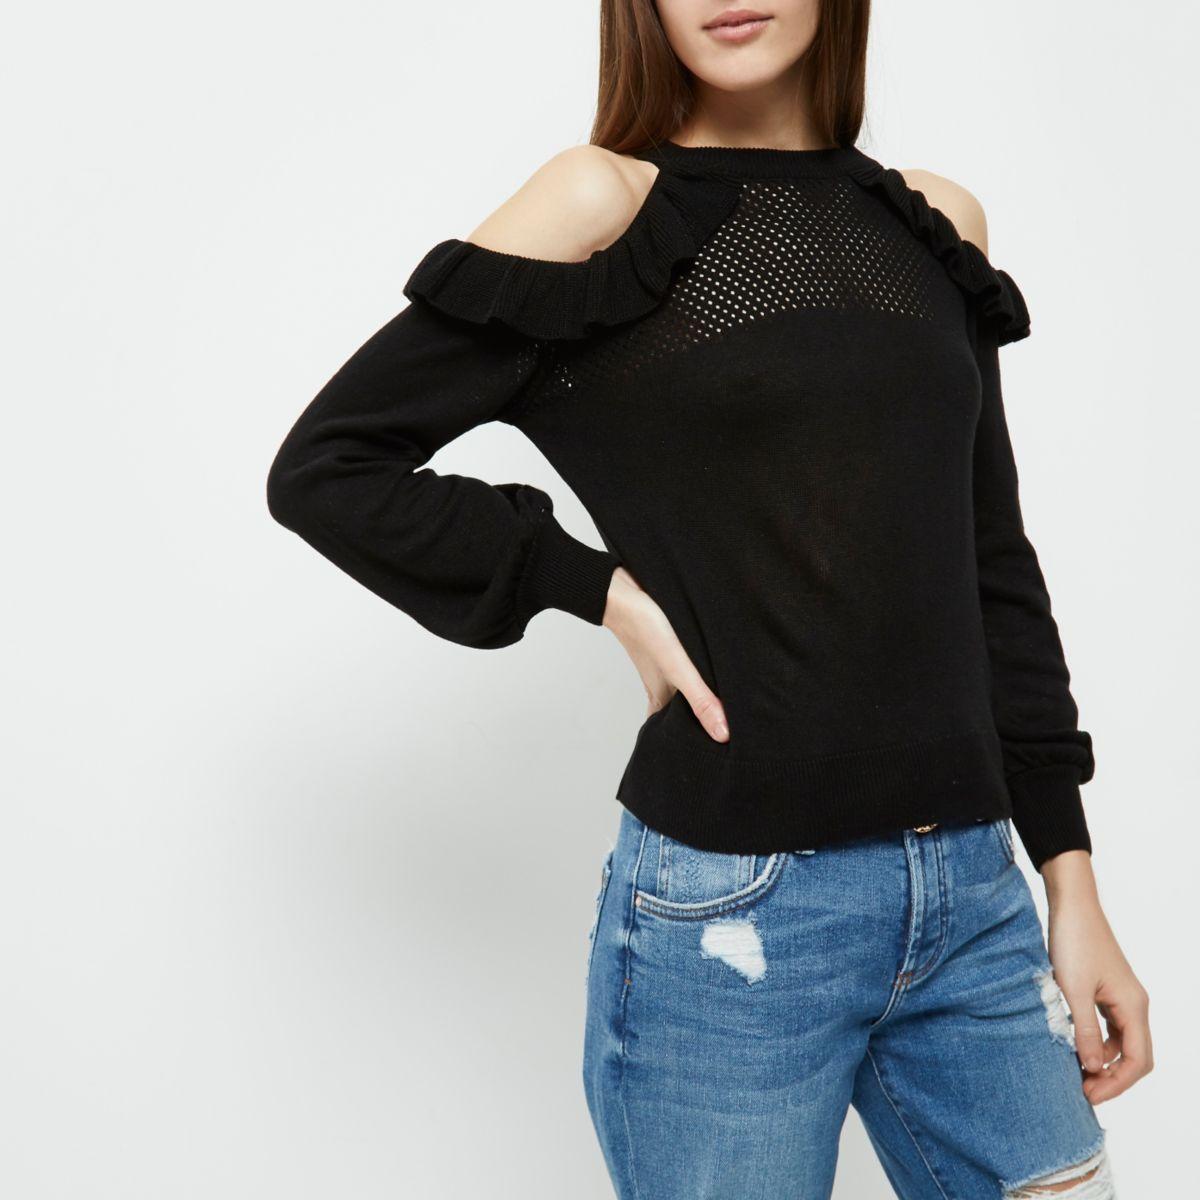 Petite black knit frill cold shoulder top